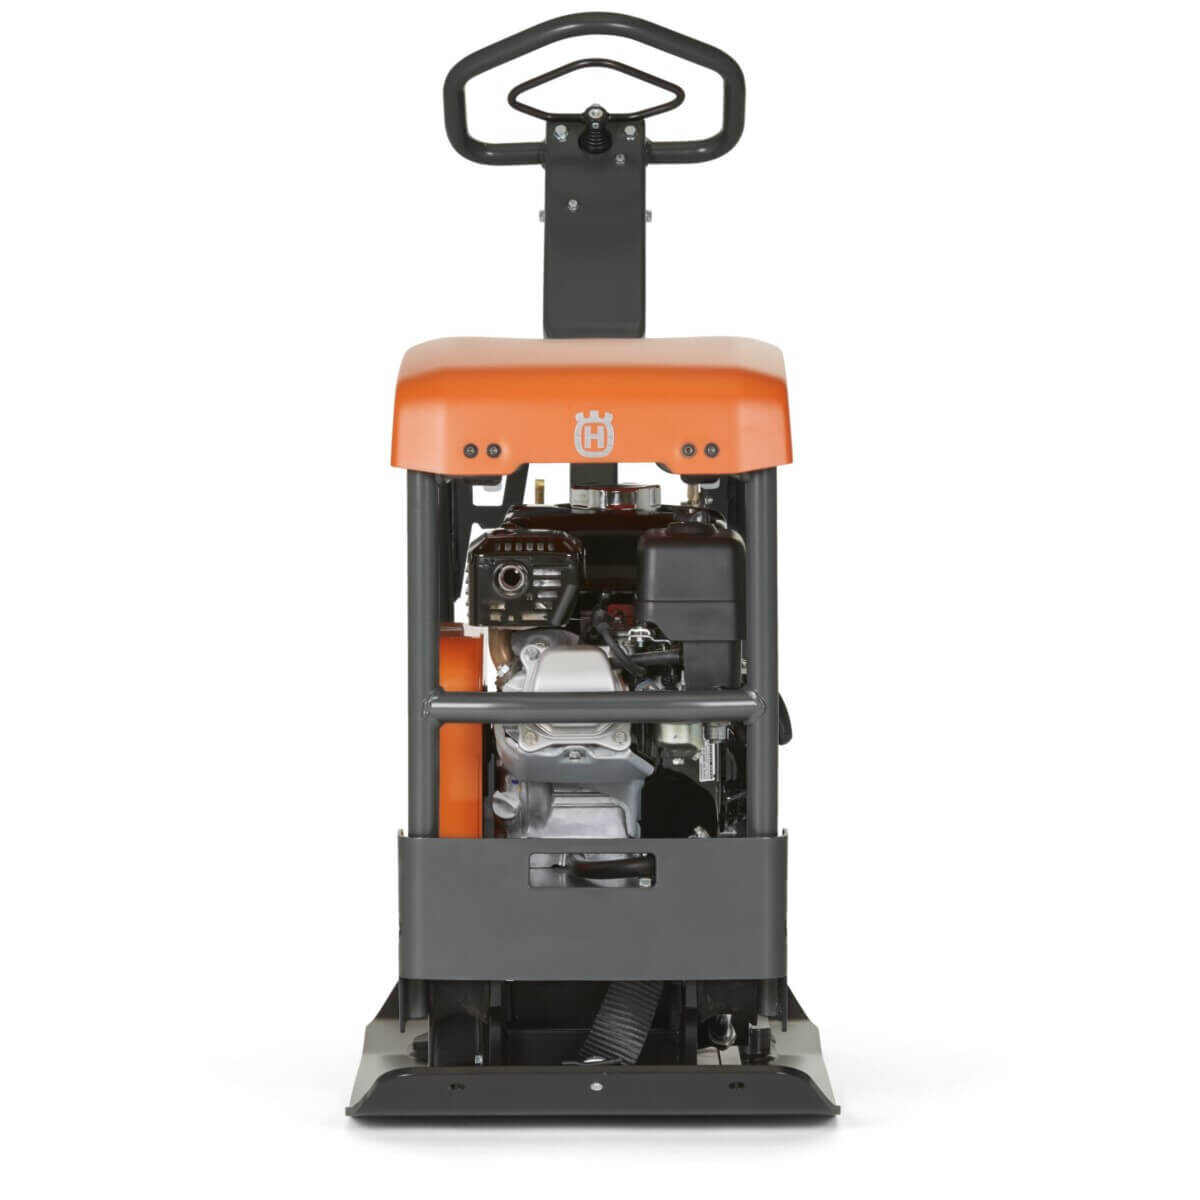 Husqvarna LG164 Driveway Plate Compactor